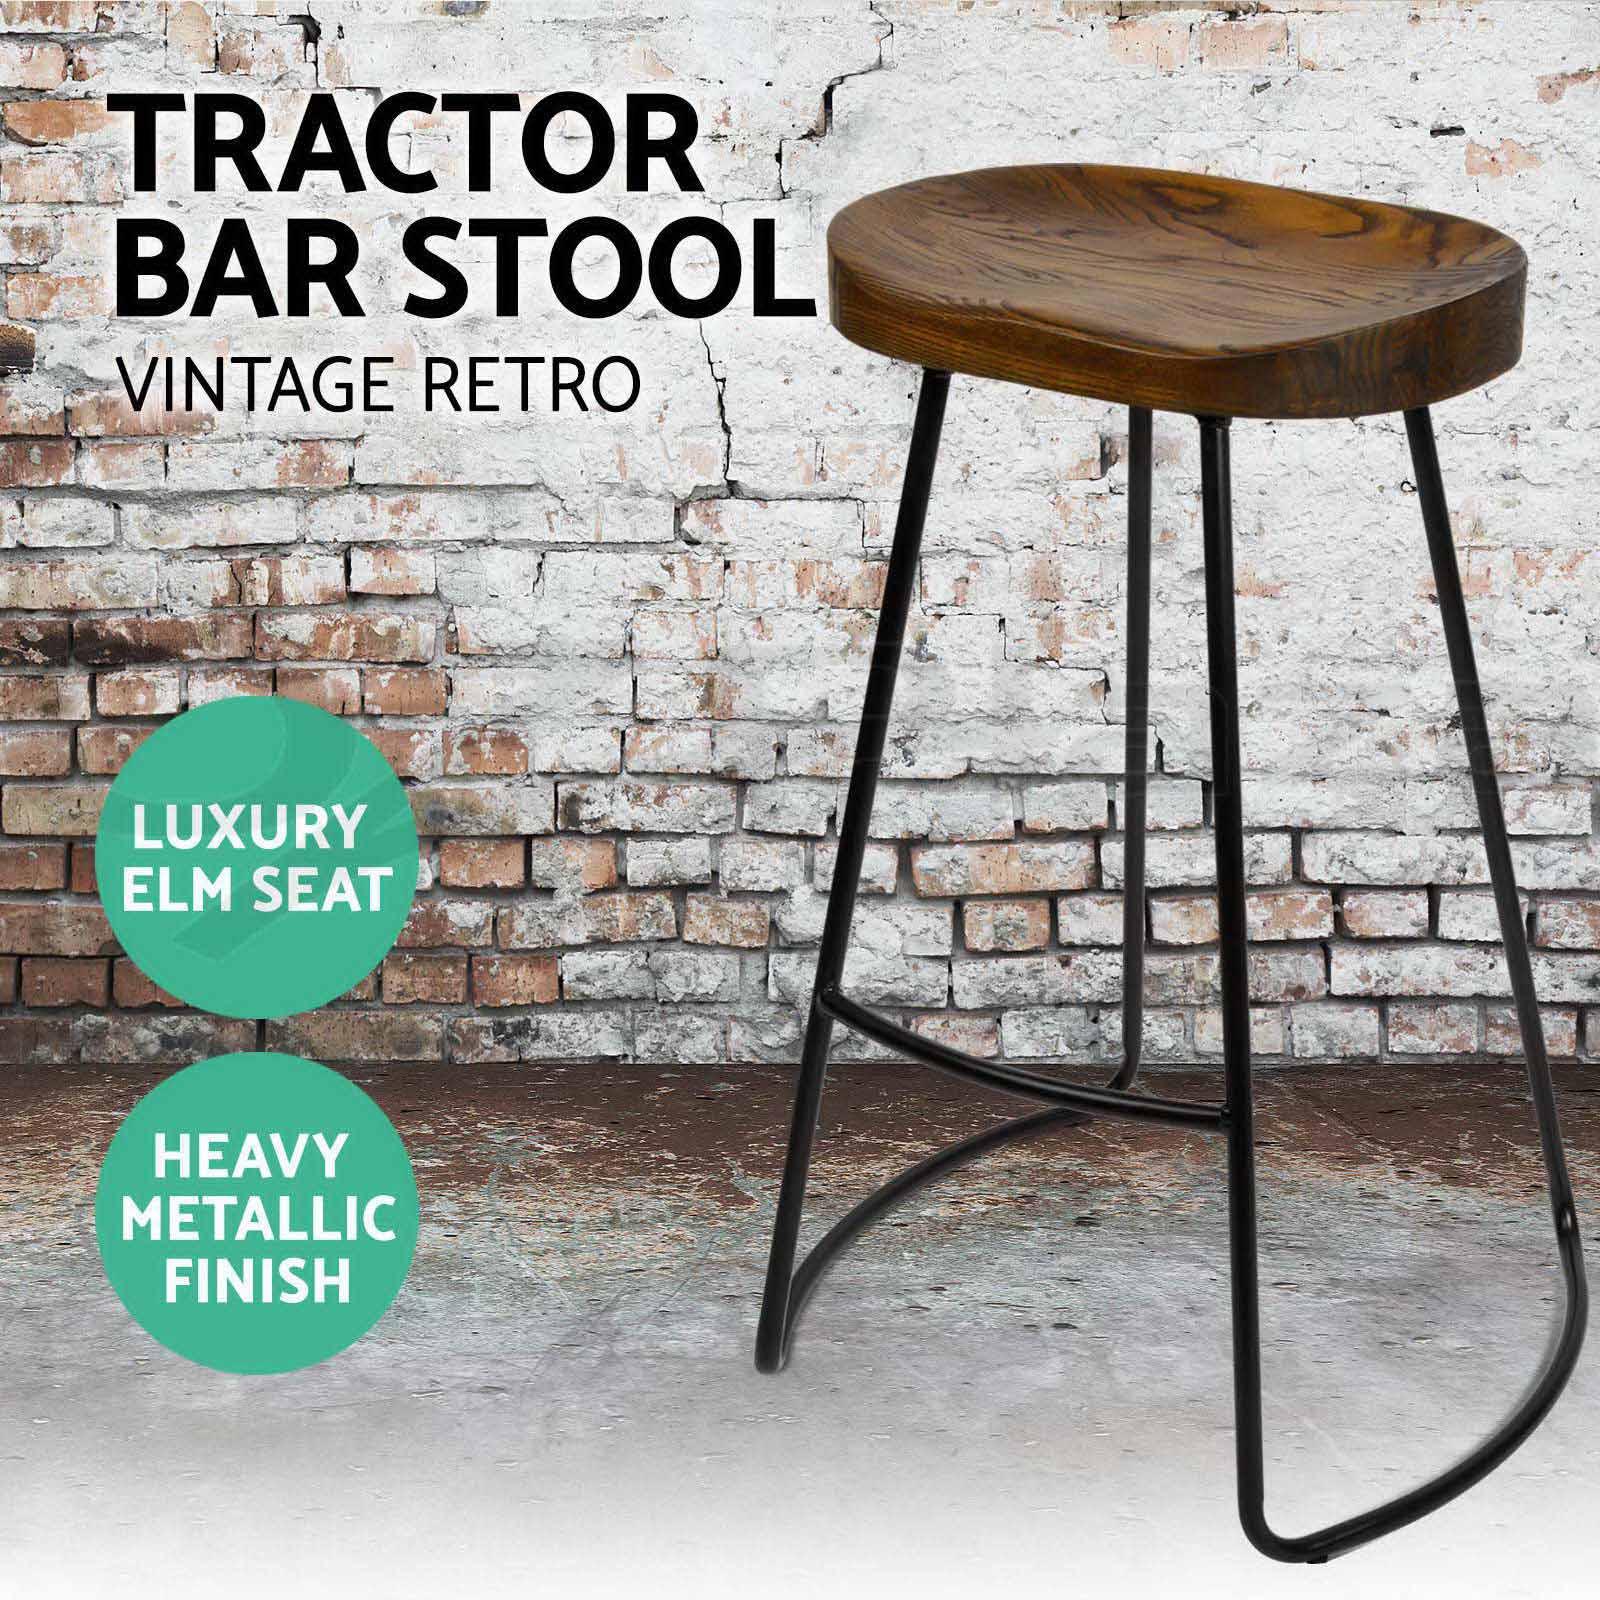 4x Industrial Retro Bar Stool Barstool Dining Chair Wooden